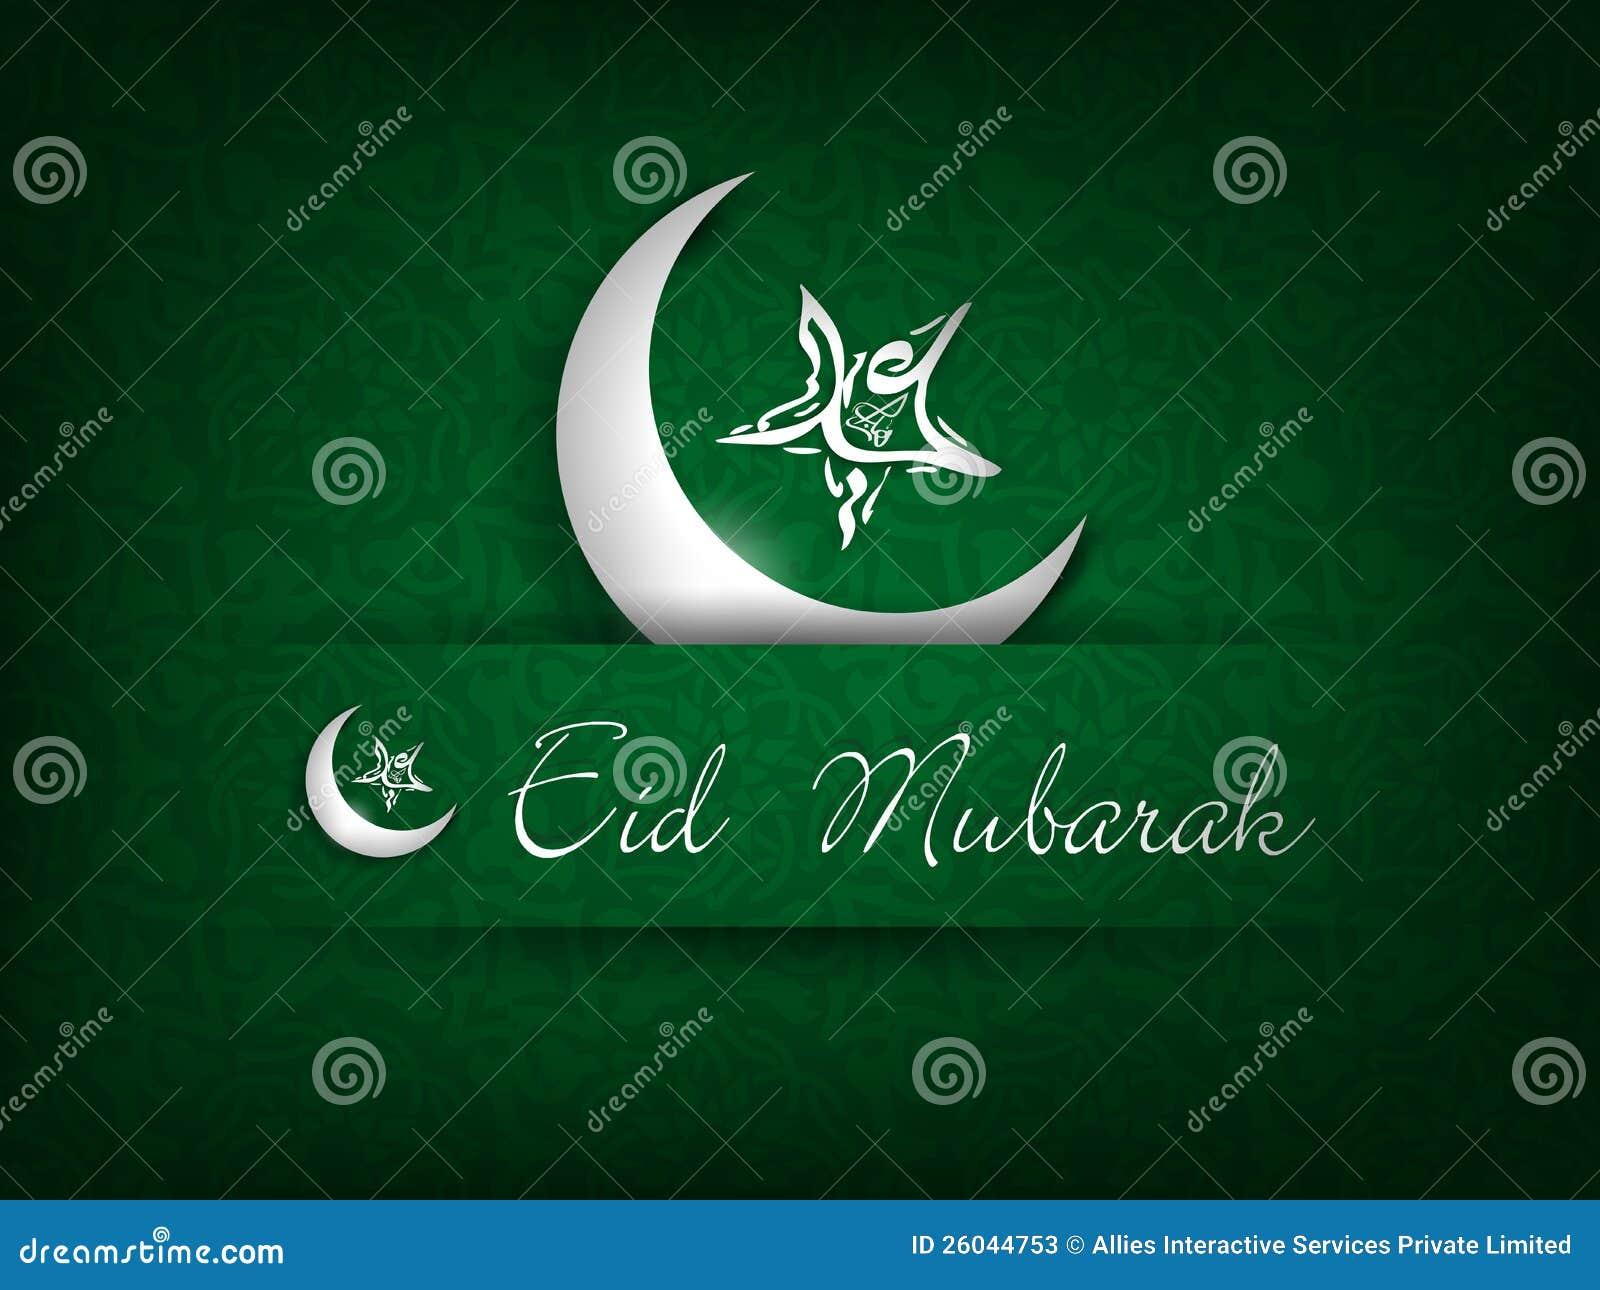 Eid mubarak sticker with moon and star stock vector royalty free stock photo kristyandbryce Choice Image